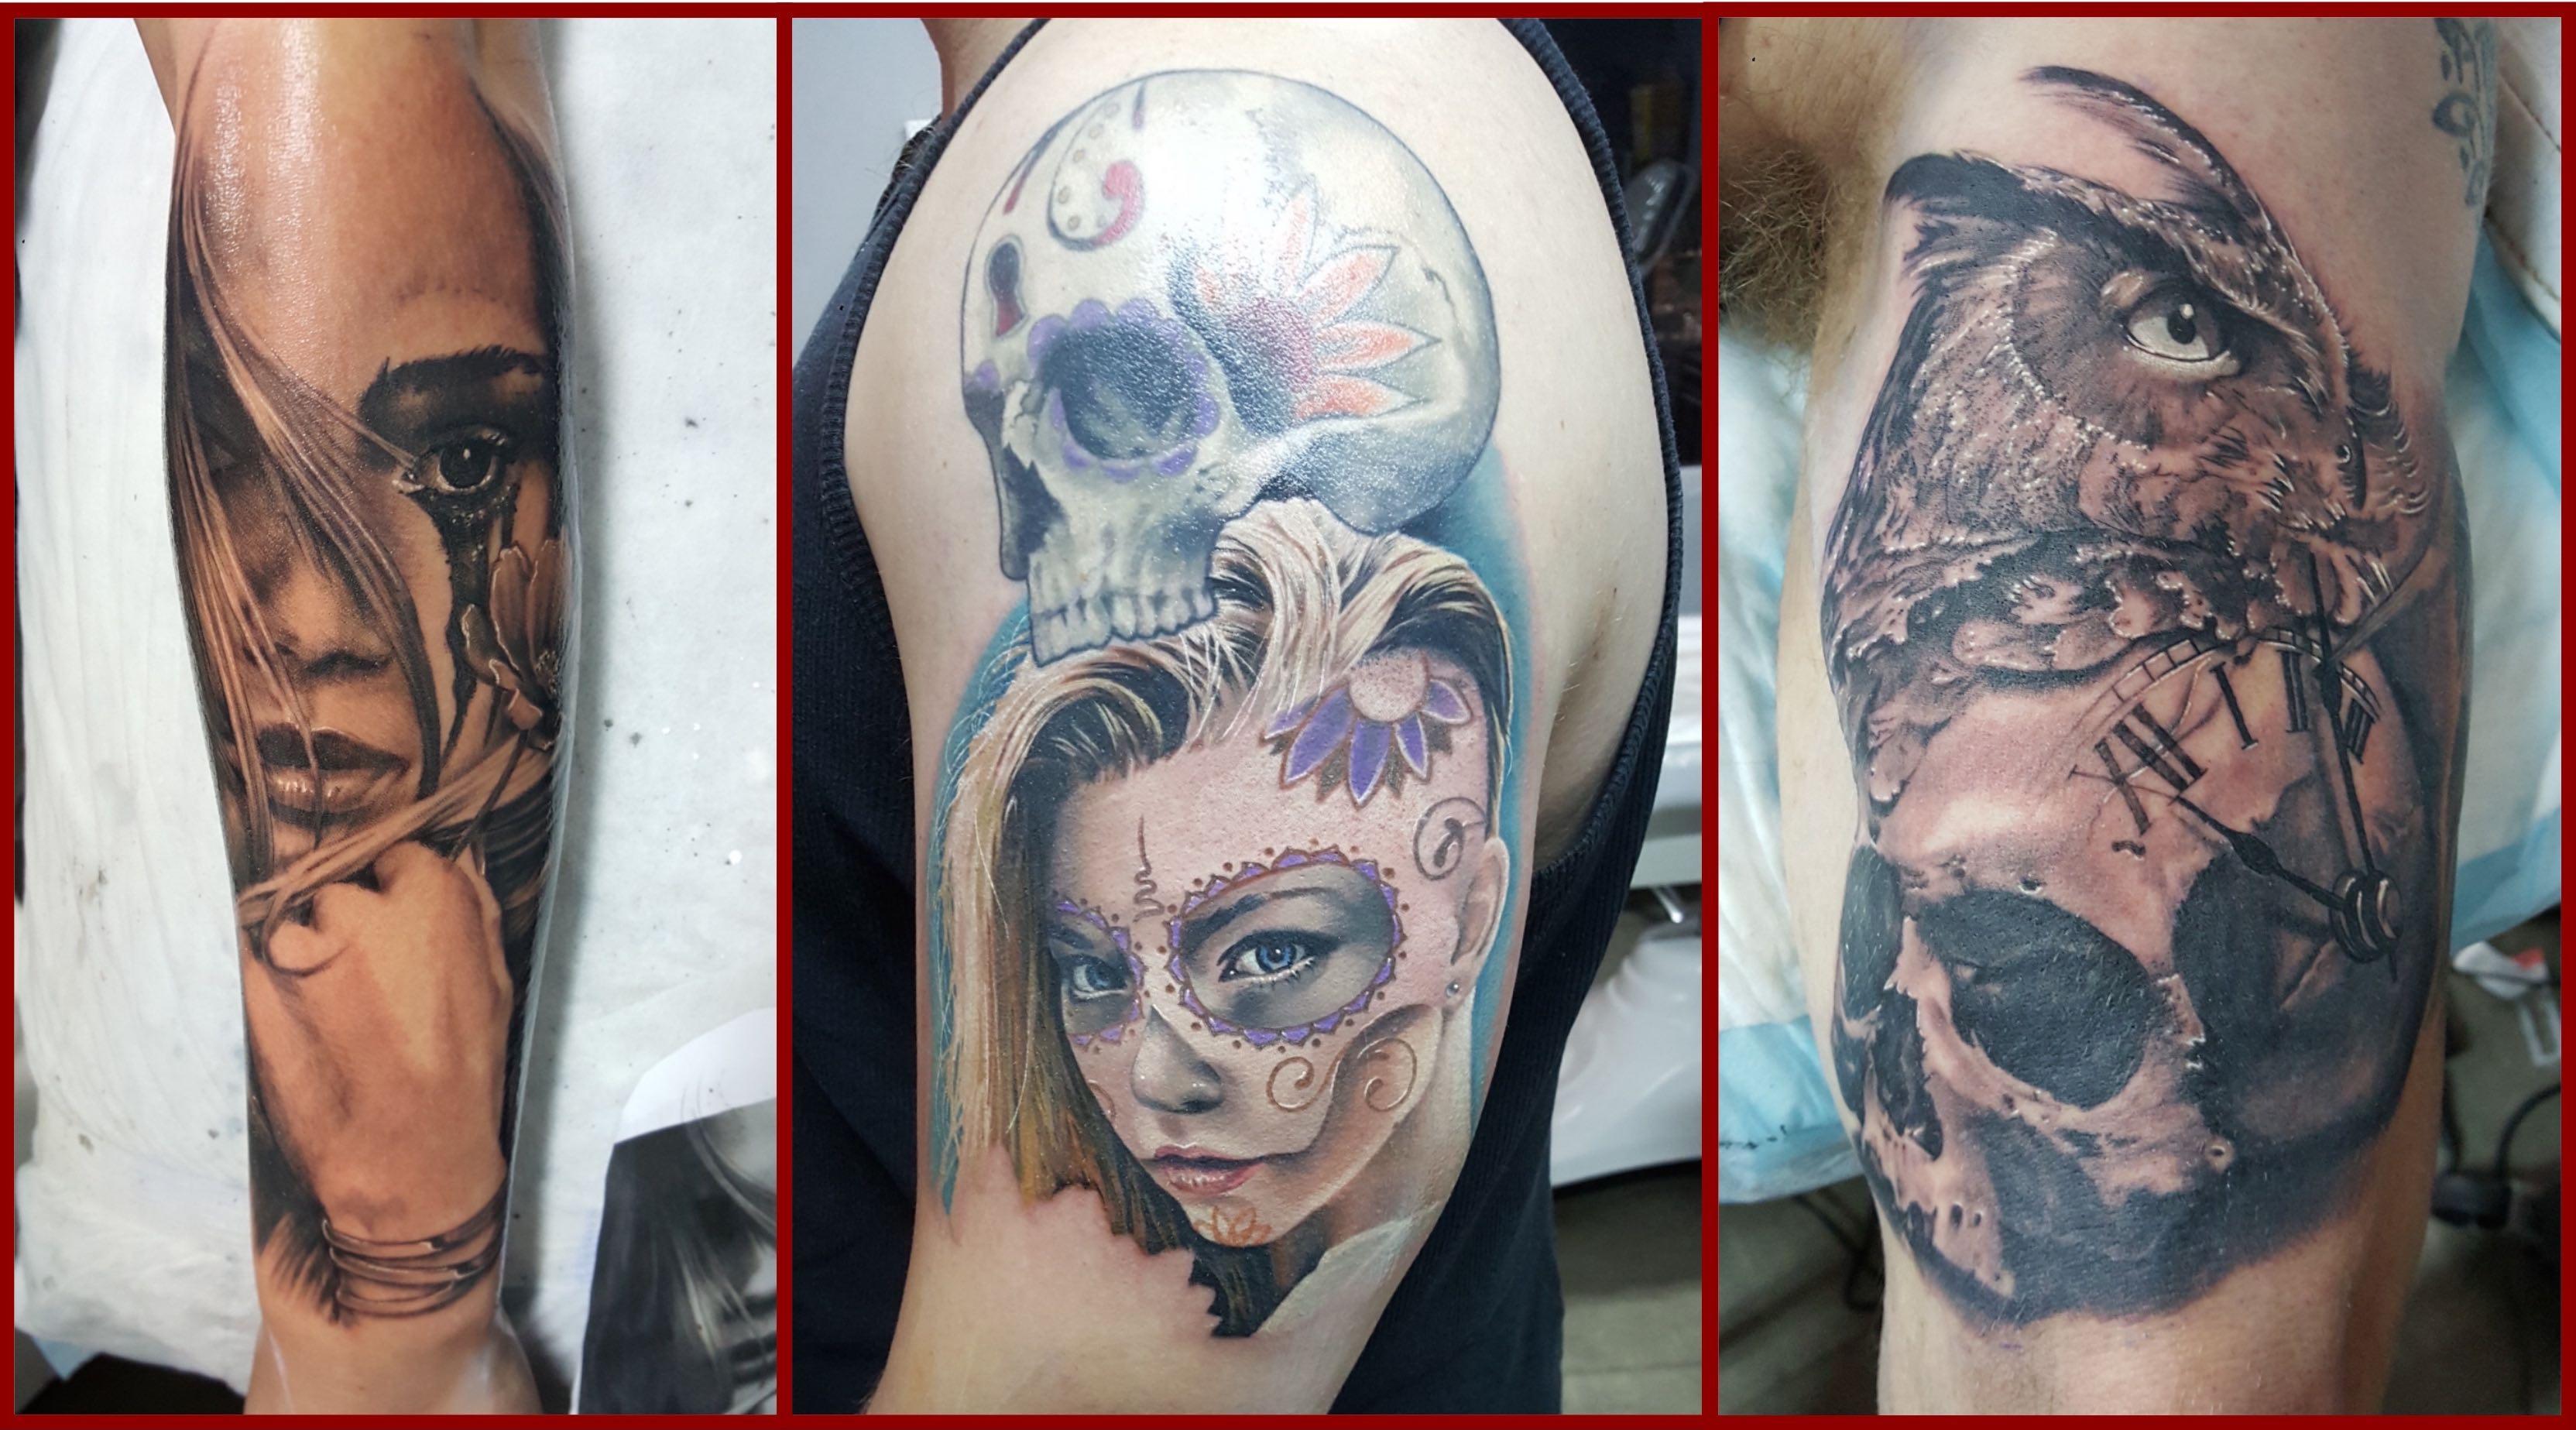 Tattoo work done by Bryan Du Rand